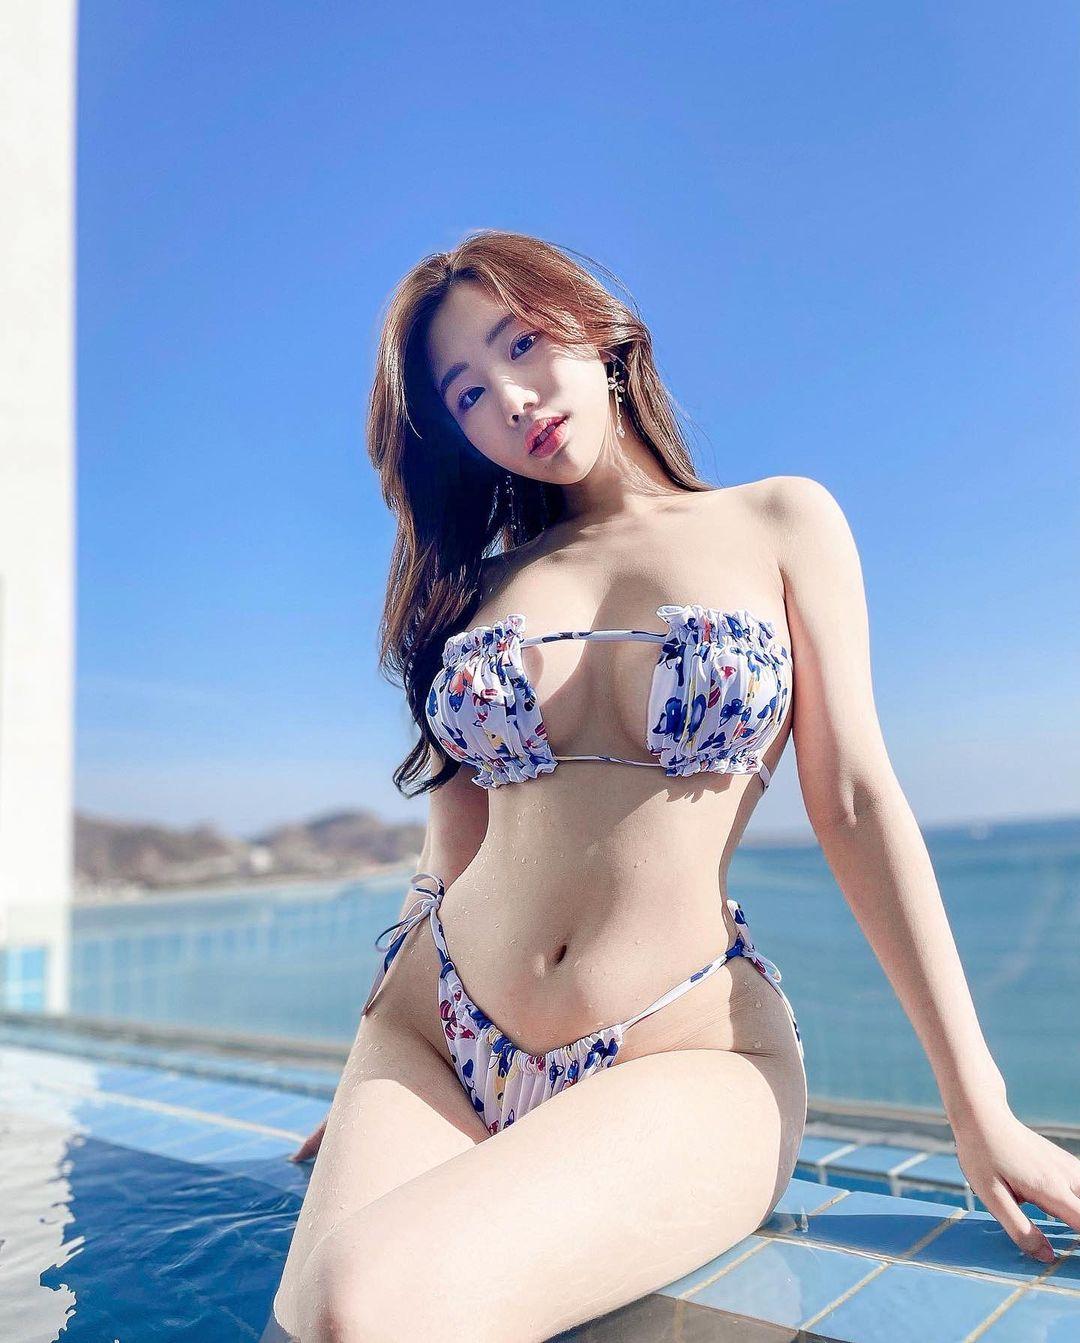 Featured image for Instagram Star Jeon yebin [전예빈] Stuns Fans in New Bikini Instagram Post